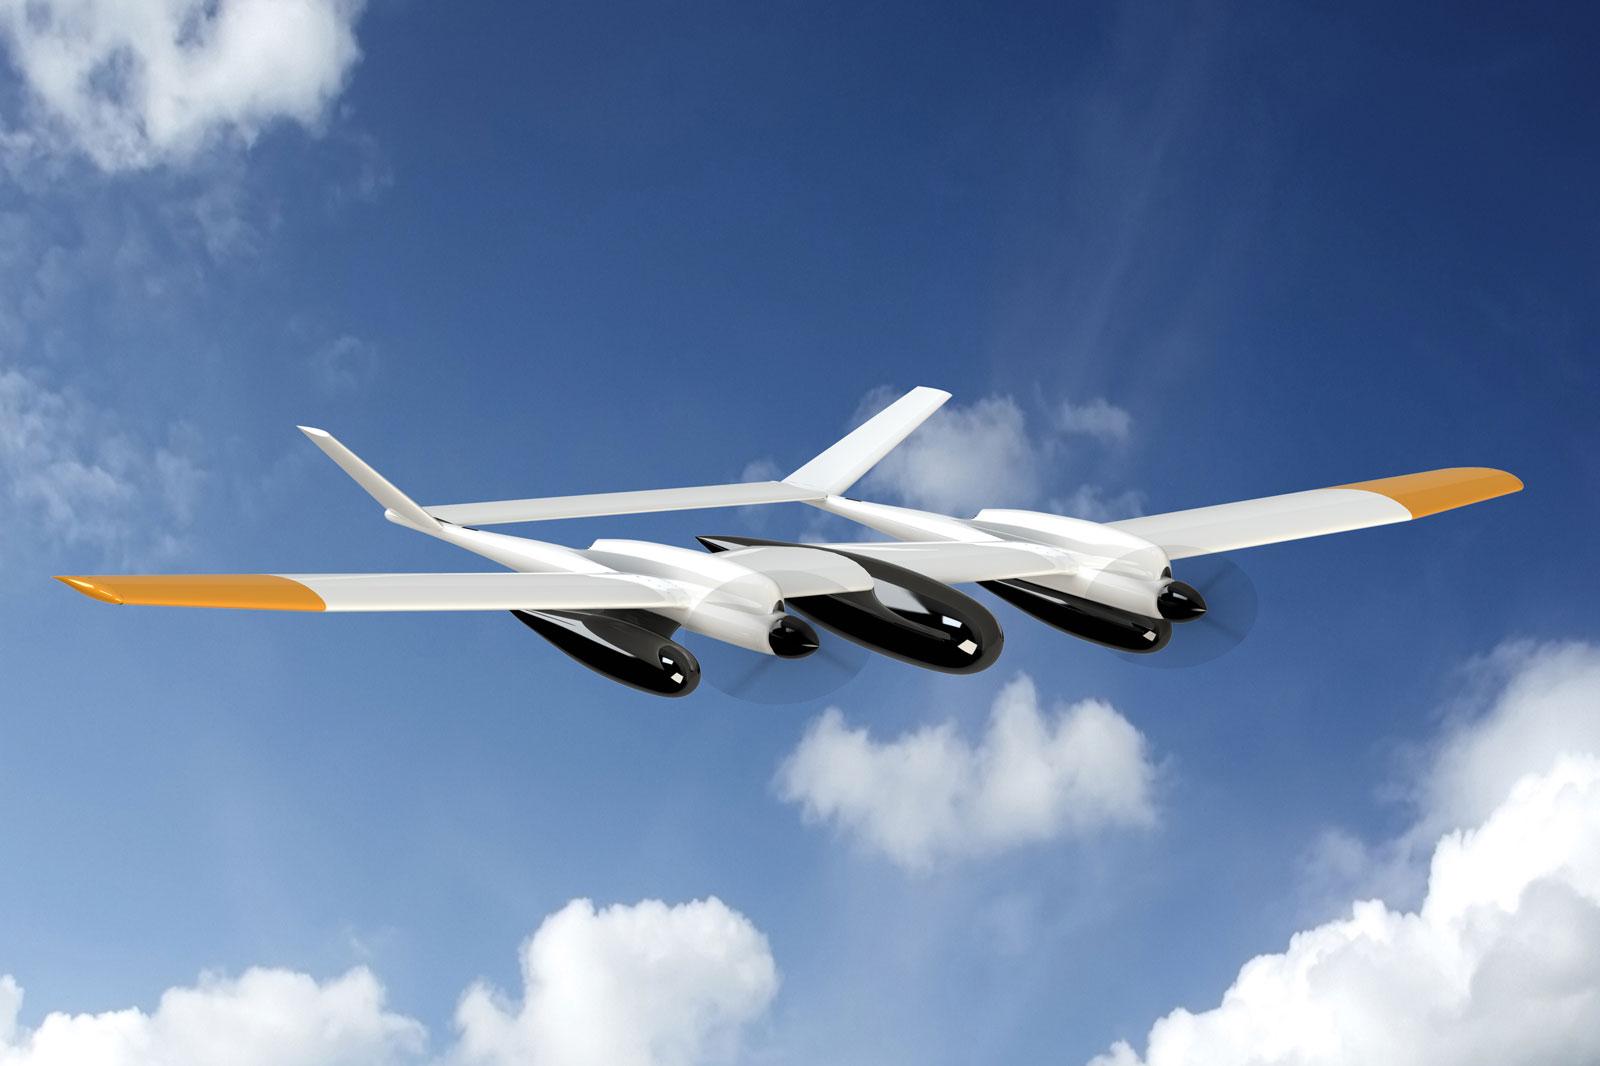 SkyBridge UAS SB-2